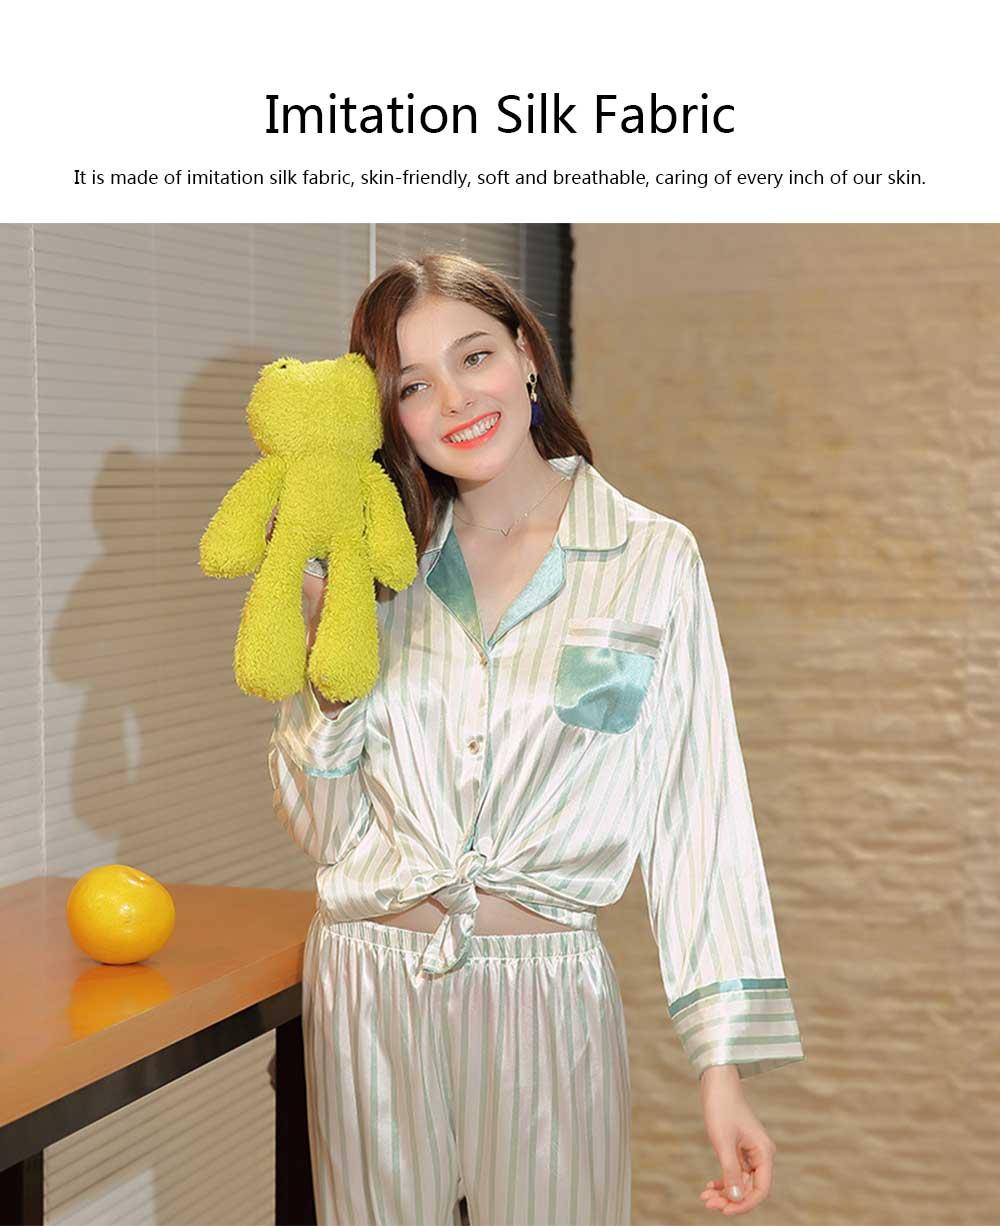 Imitation Silk Fabric Long-sleeved Pajamas set, Classic Lapel Fashion Casual Striped Tracksuit, Spring and Autumn 2019 4